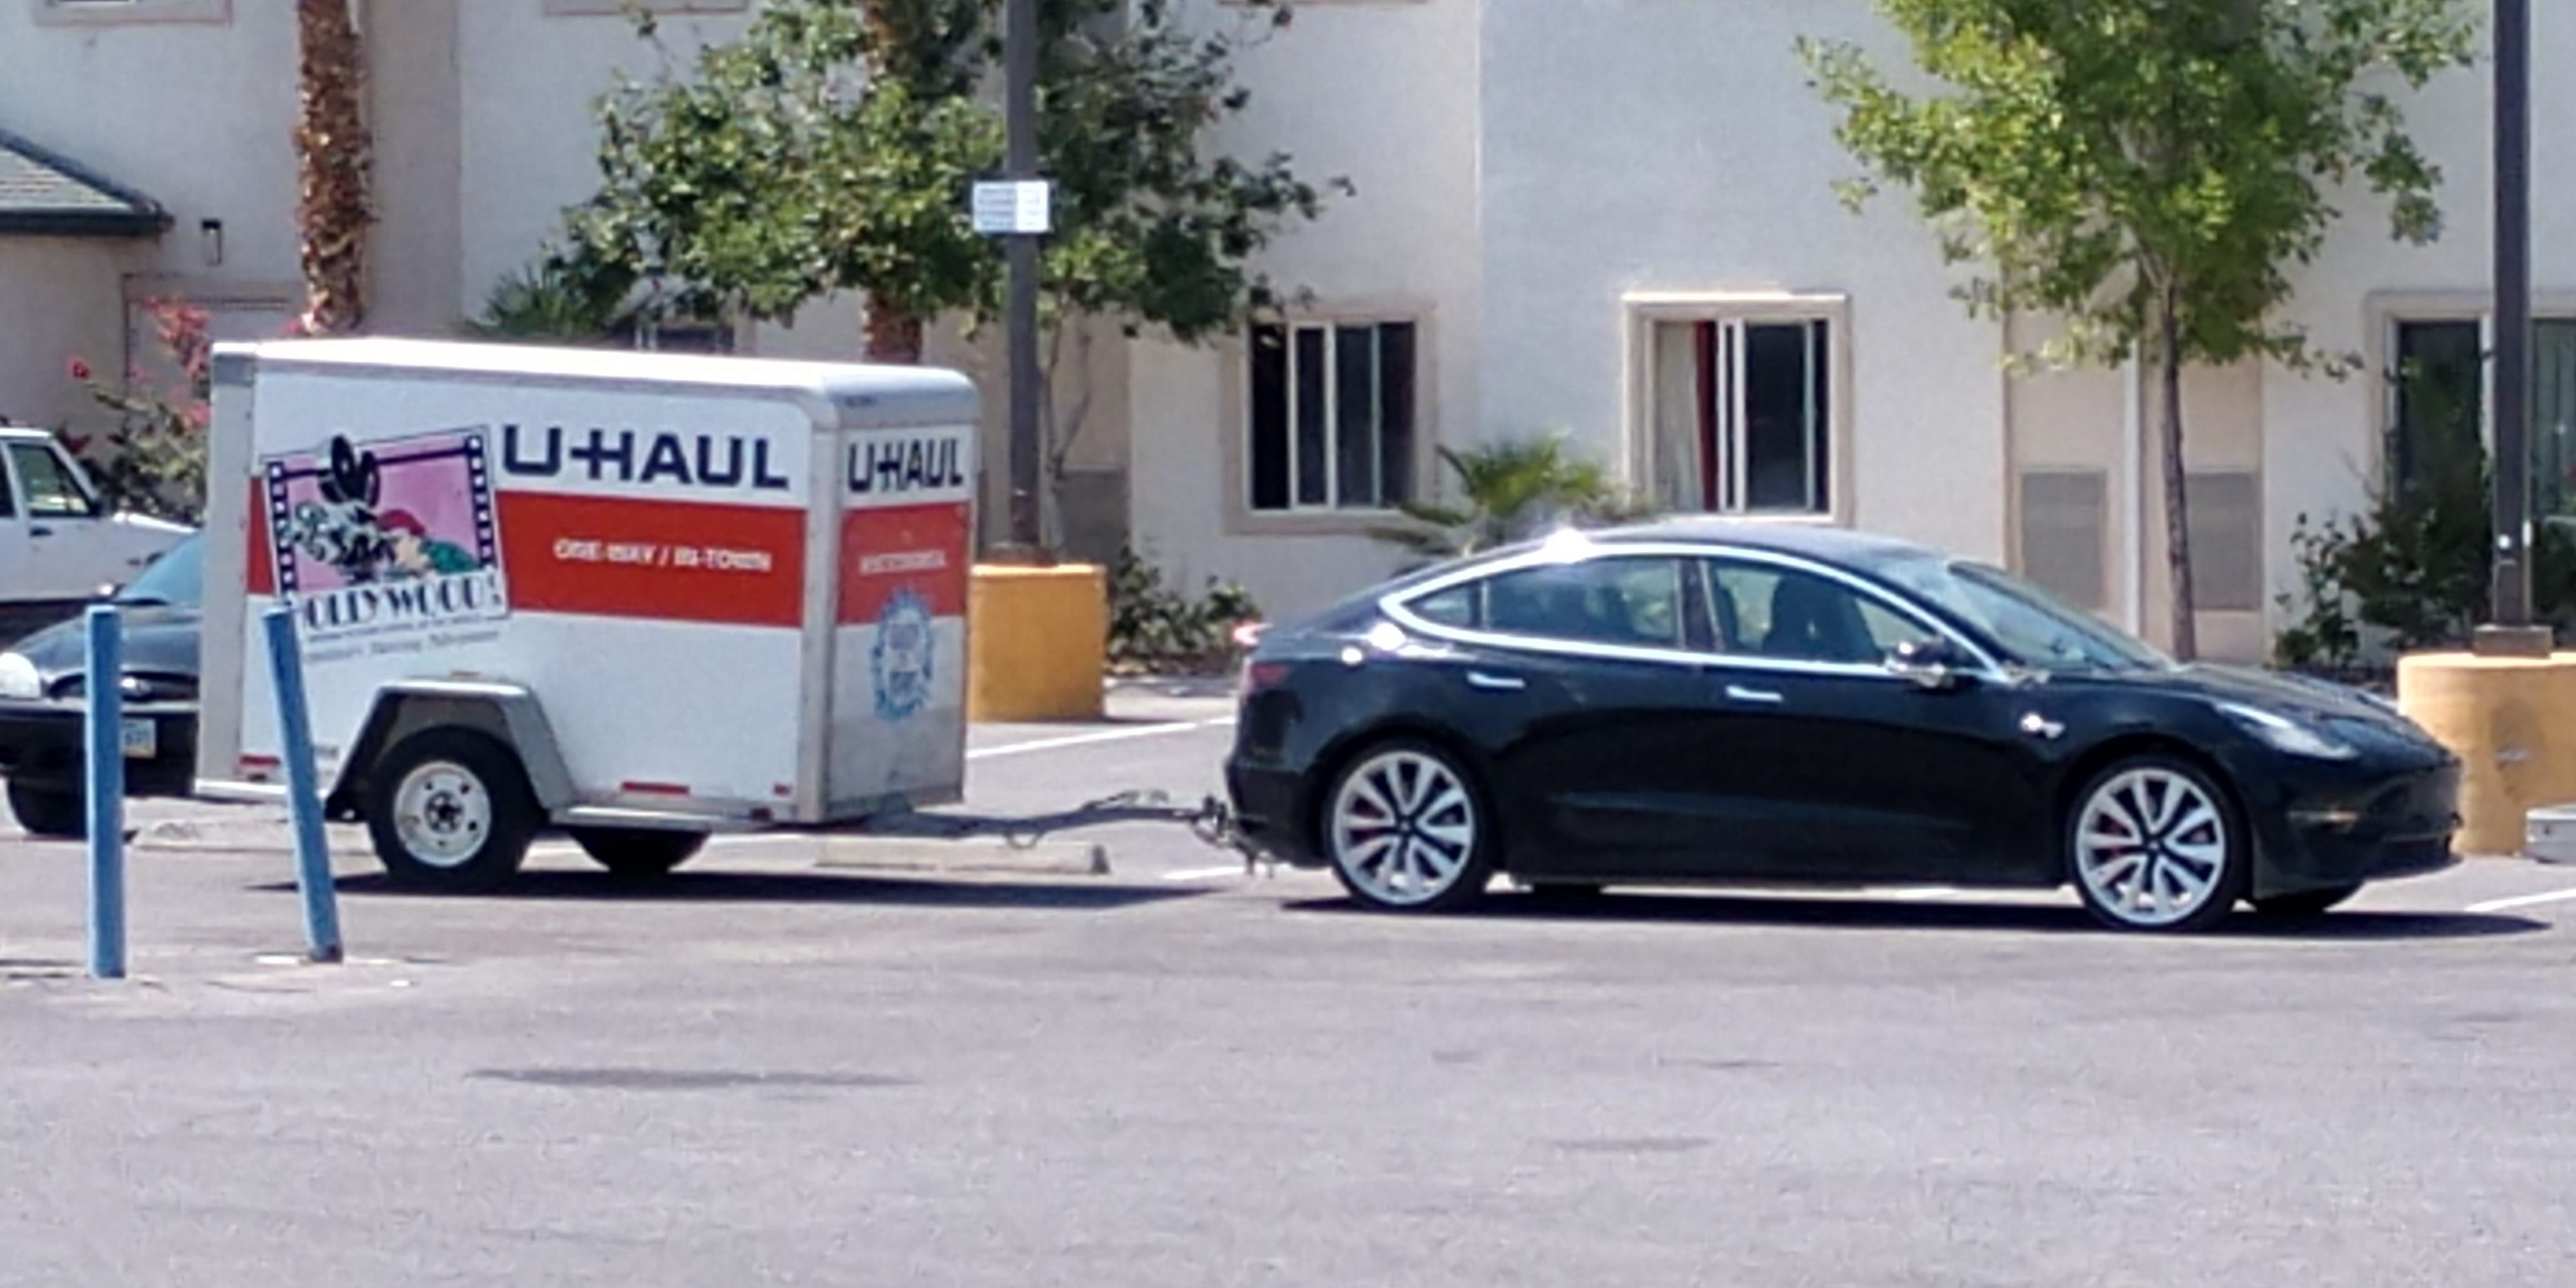 Tesla towing capacity